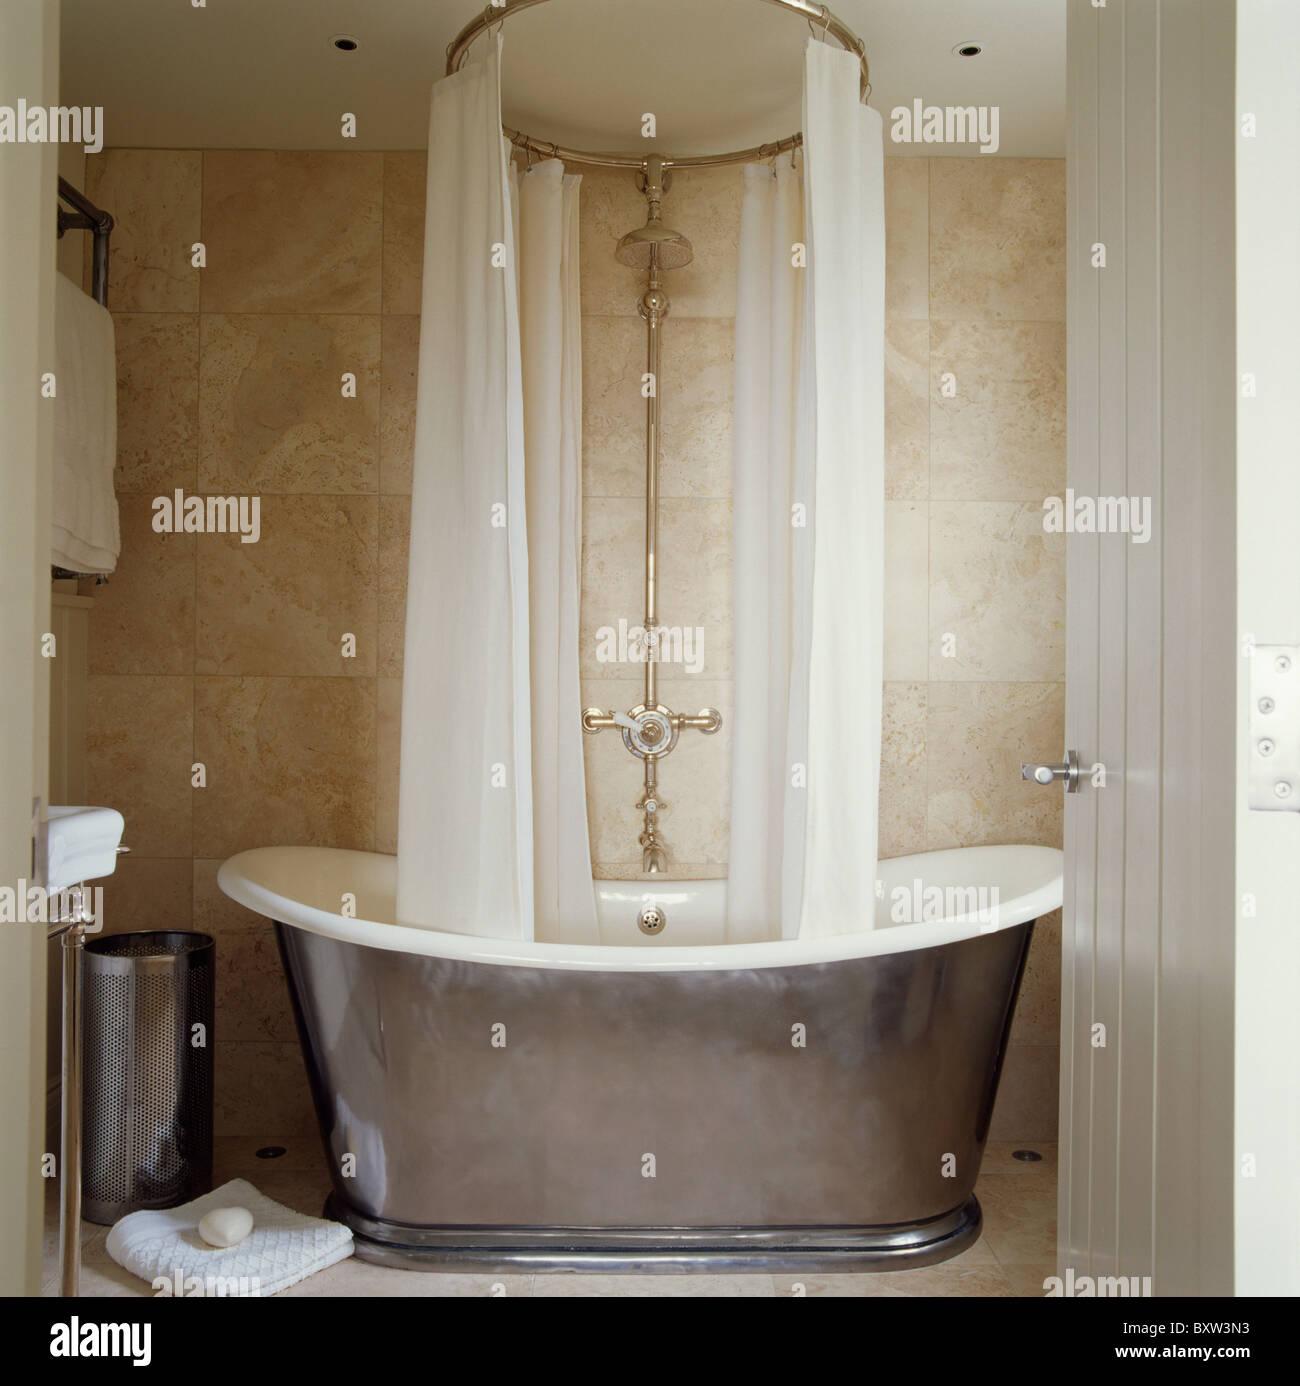 Travertine Bathroom Stock Photos & Travertine Bathroom Stock Images ...